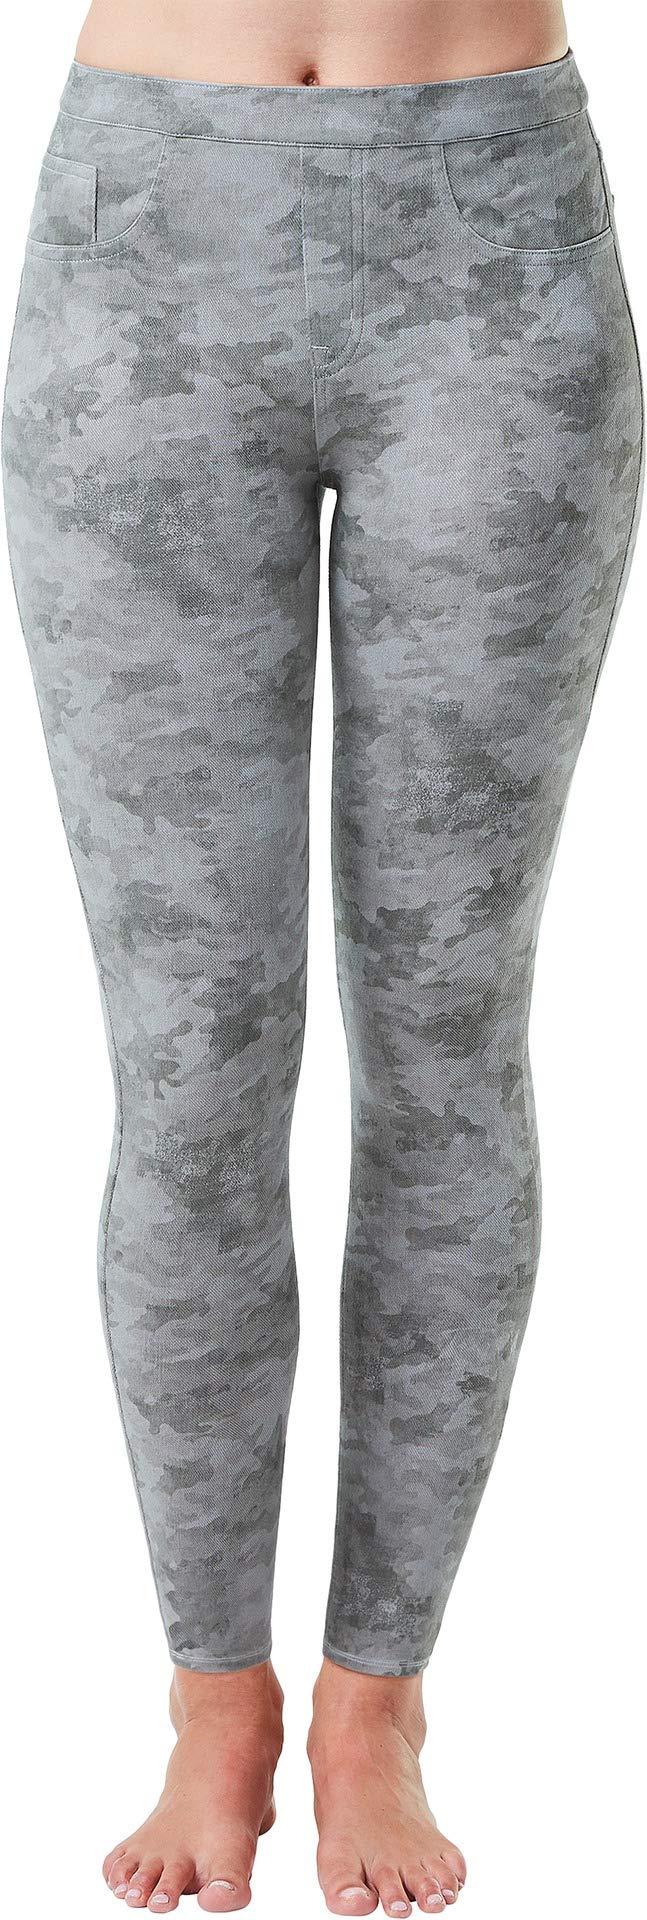 SPANX Women's Jean-ish Ankle Leggings Stone Wash Camo Large 27